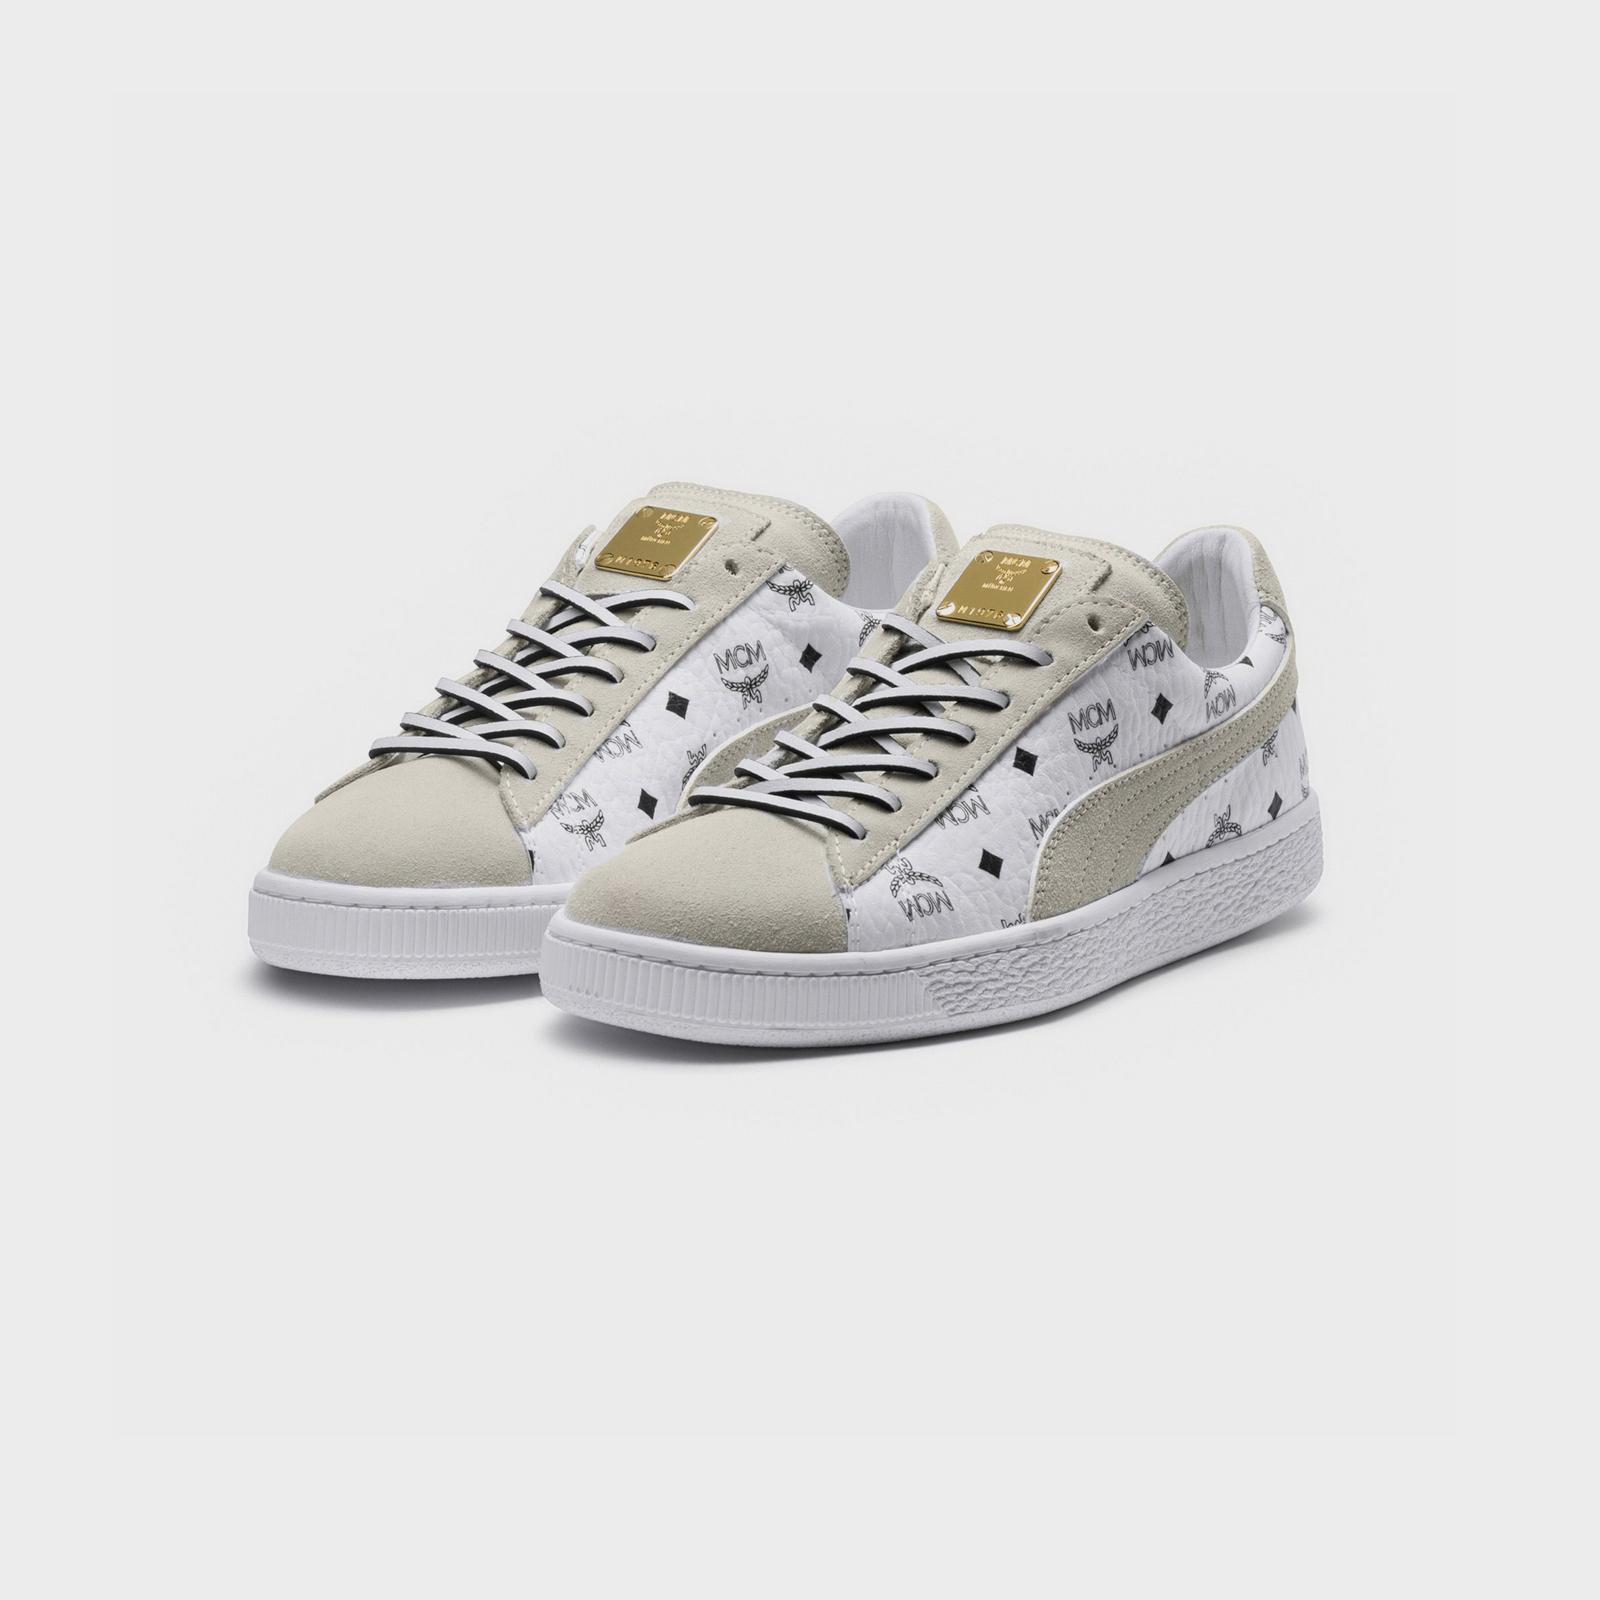 Puma Suede Classic x MCM 366299 02 Sneakersnstuff